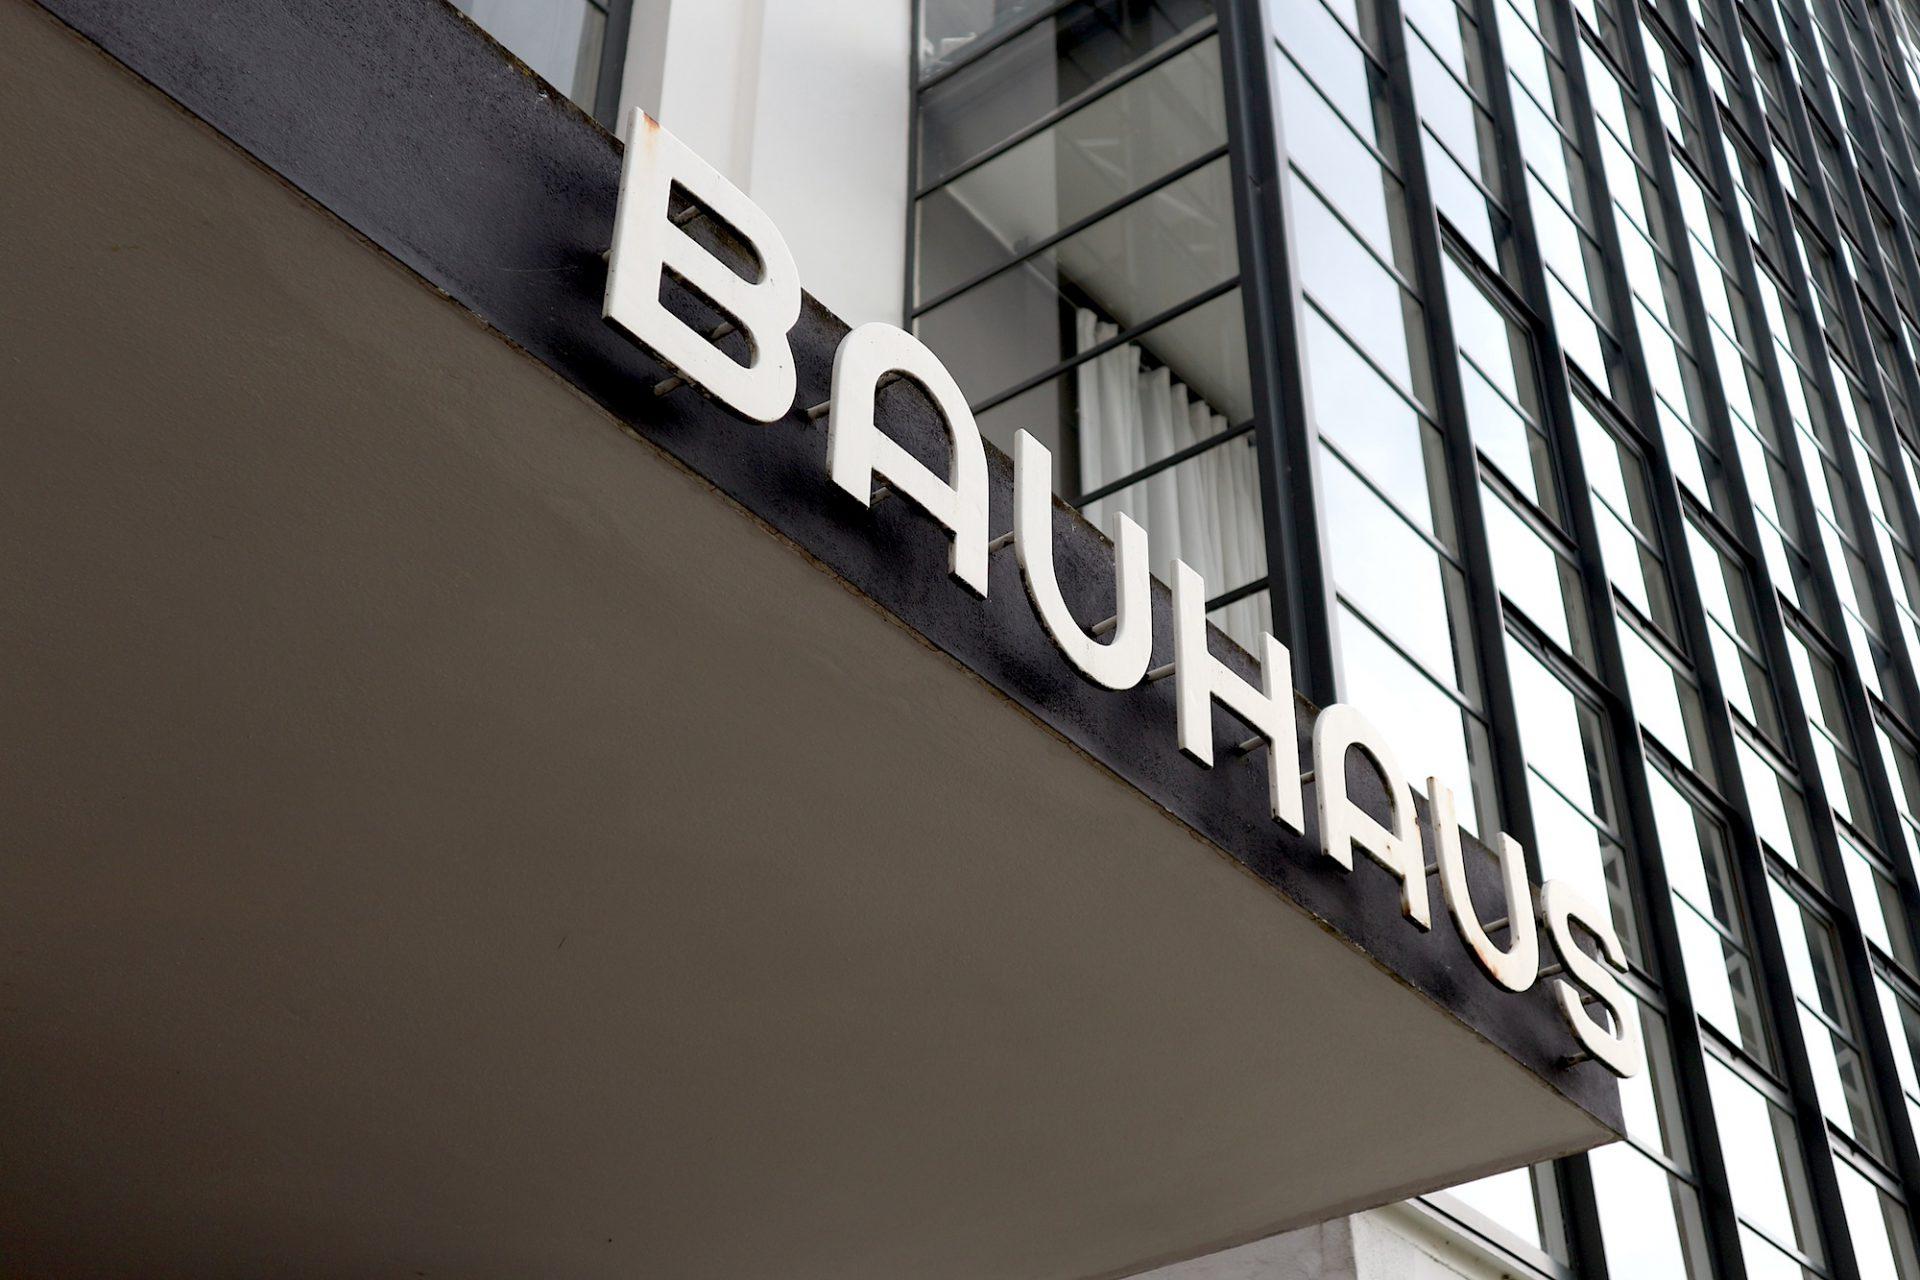 Eingang. Bauhausgebäude